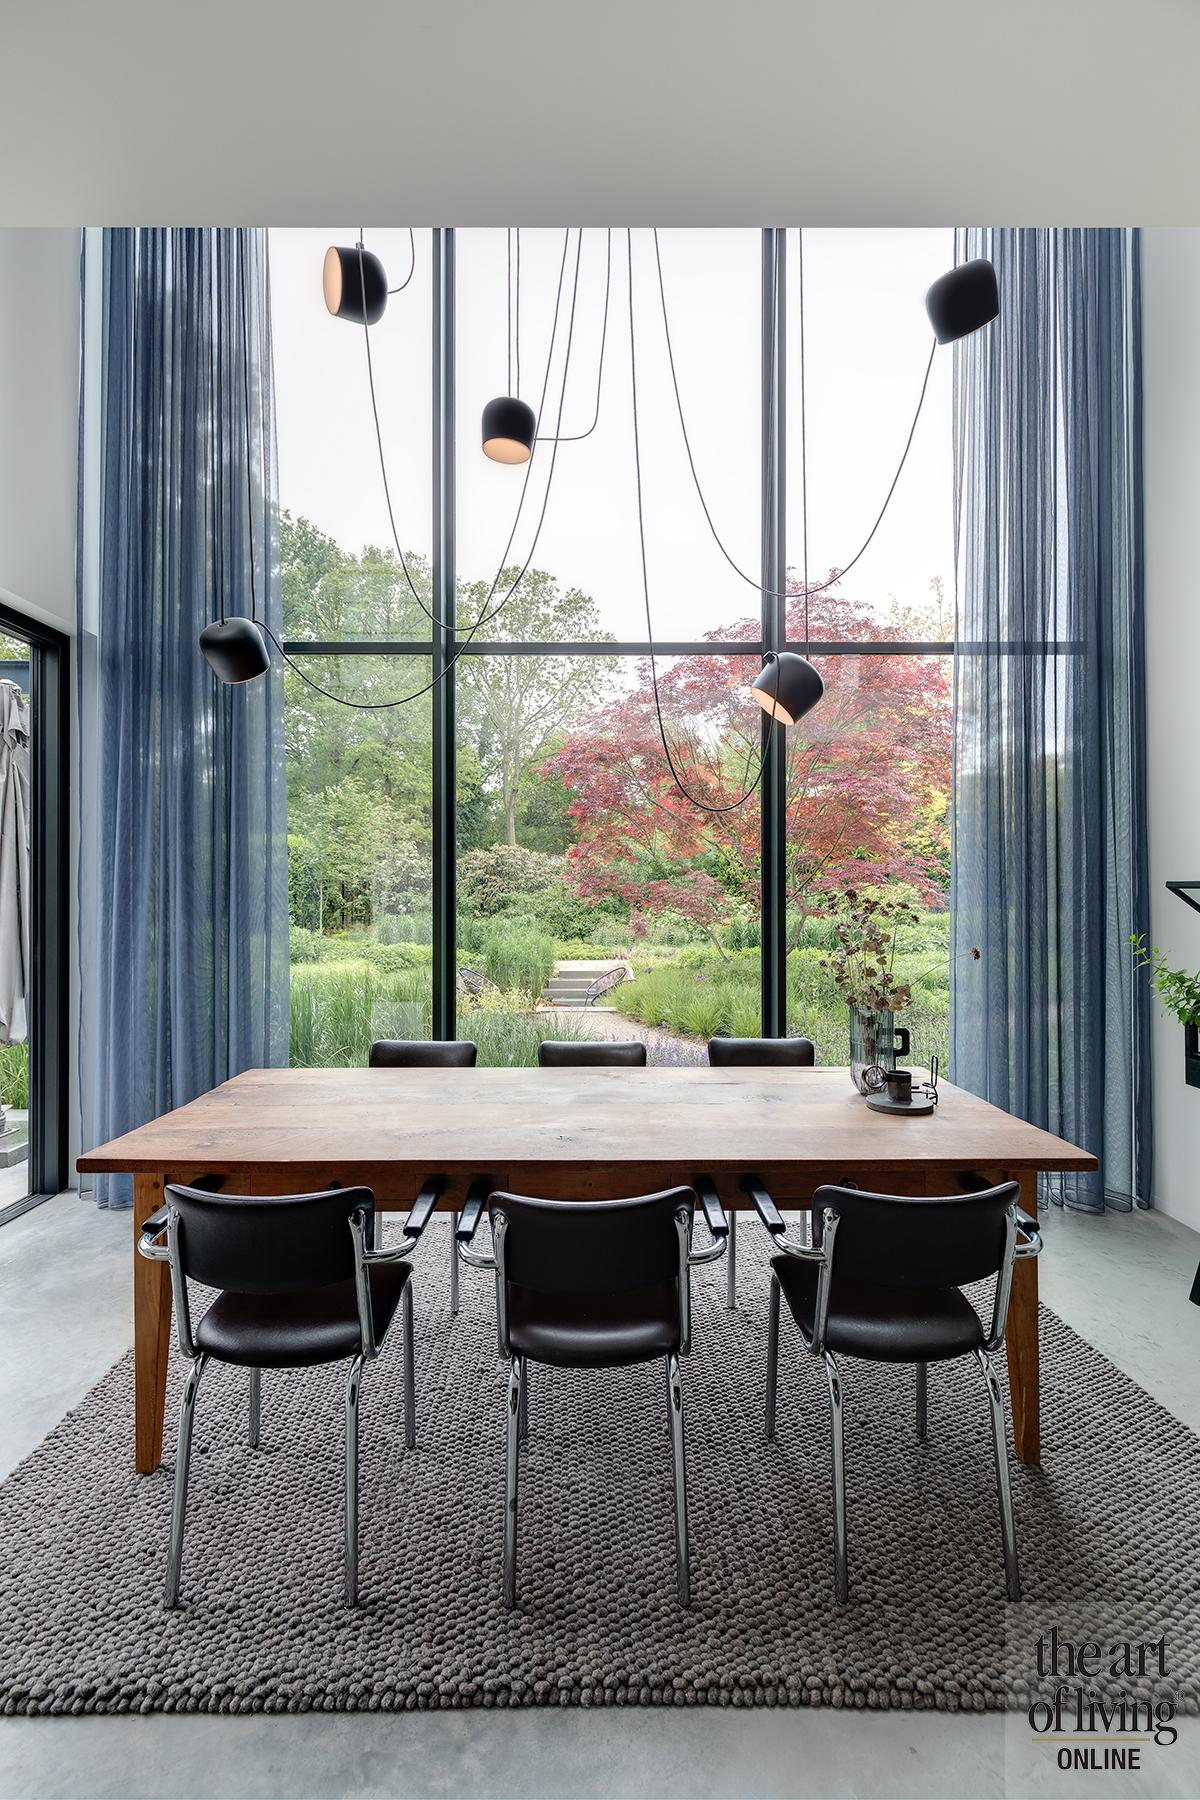 Nieuwbouwvilla, Station-D, the art of living